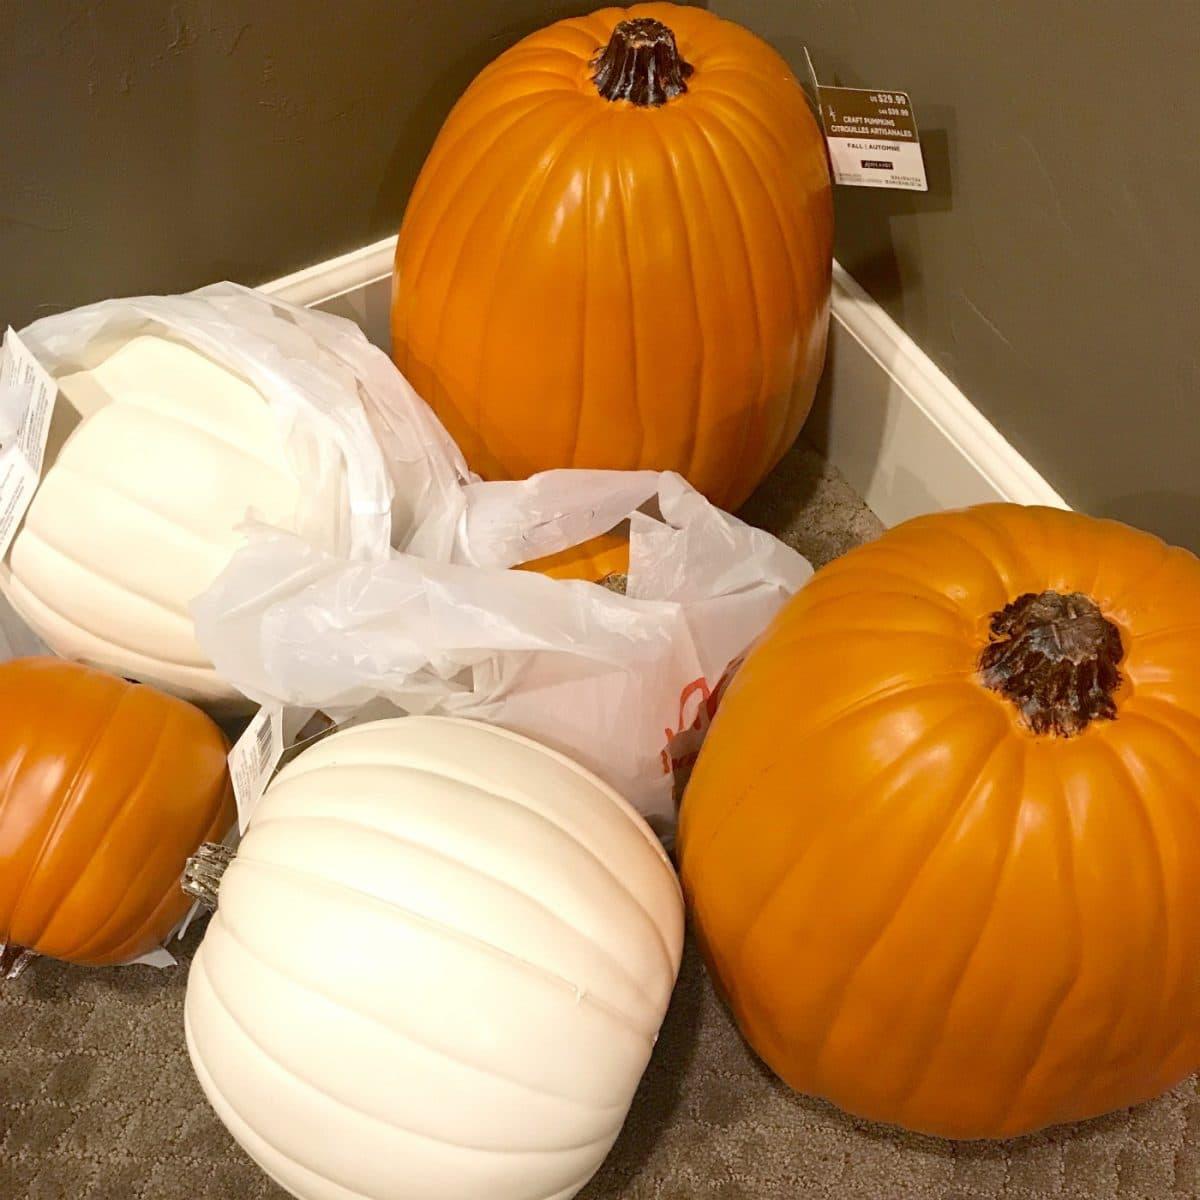 Assortment of white and orange craft pumpkins.